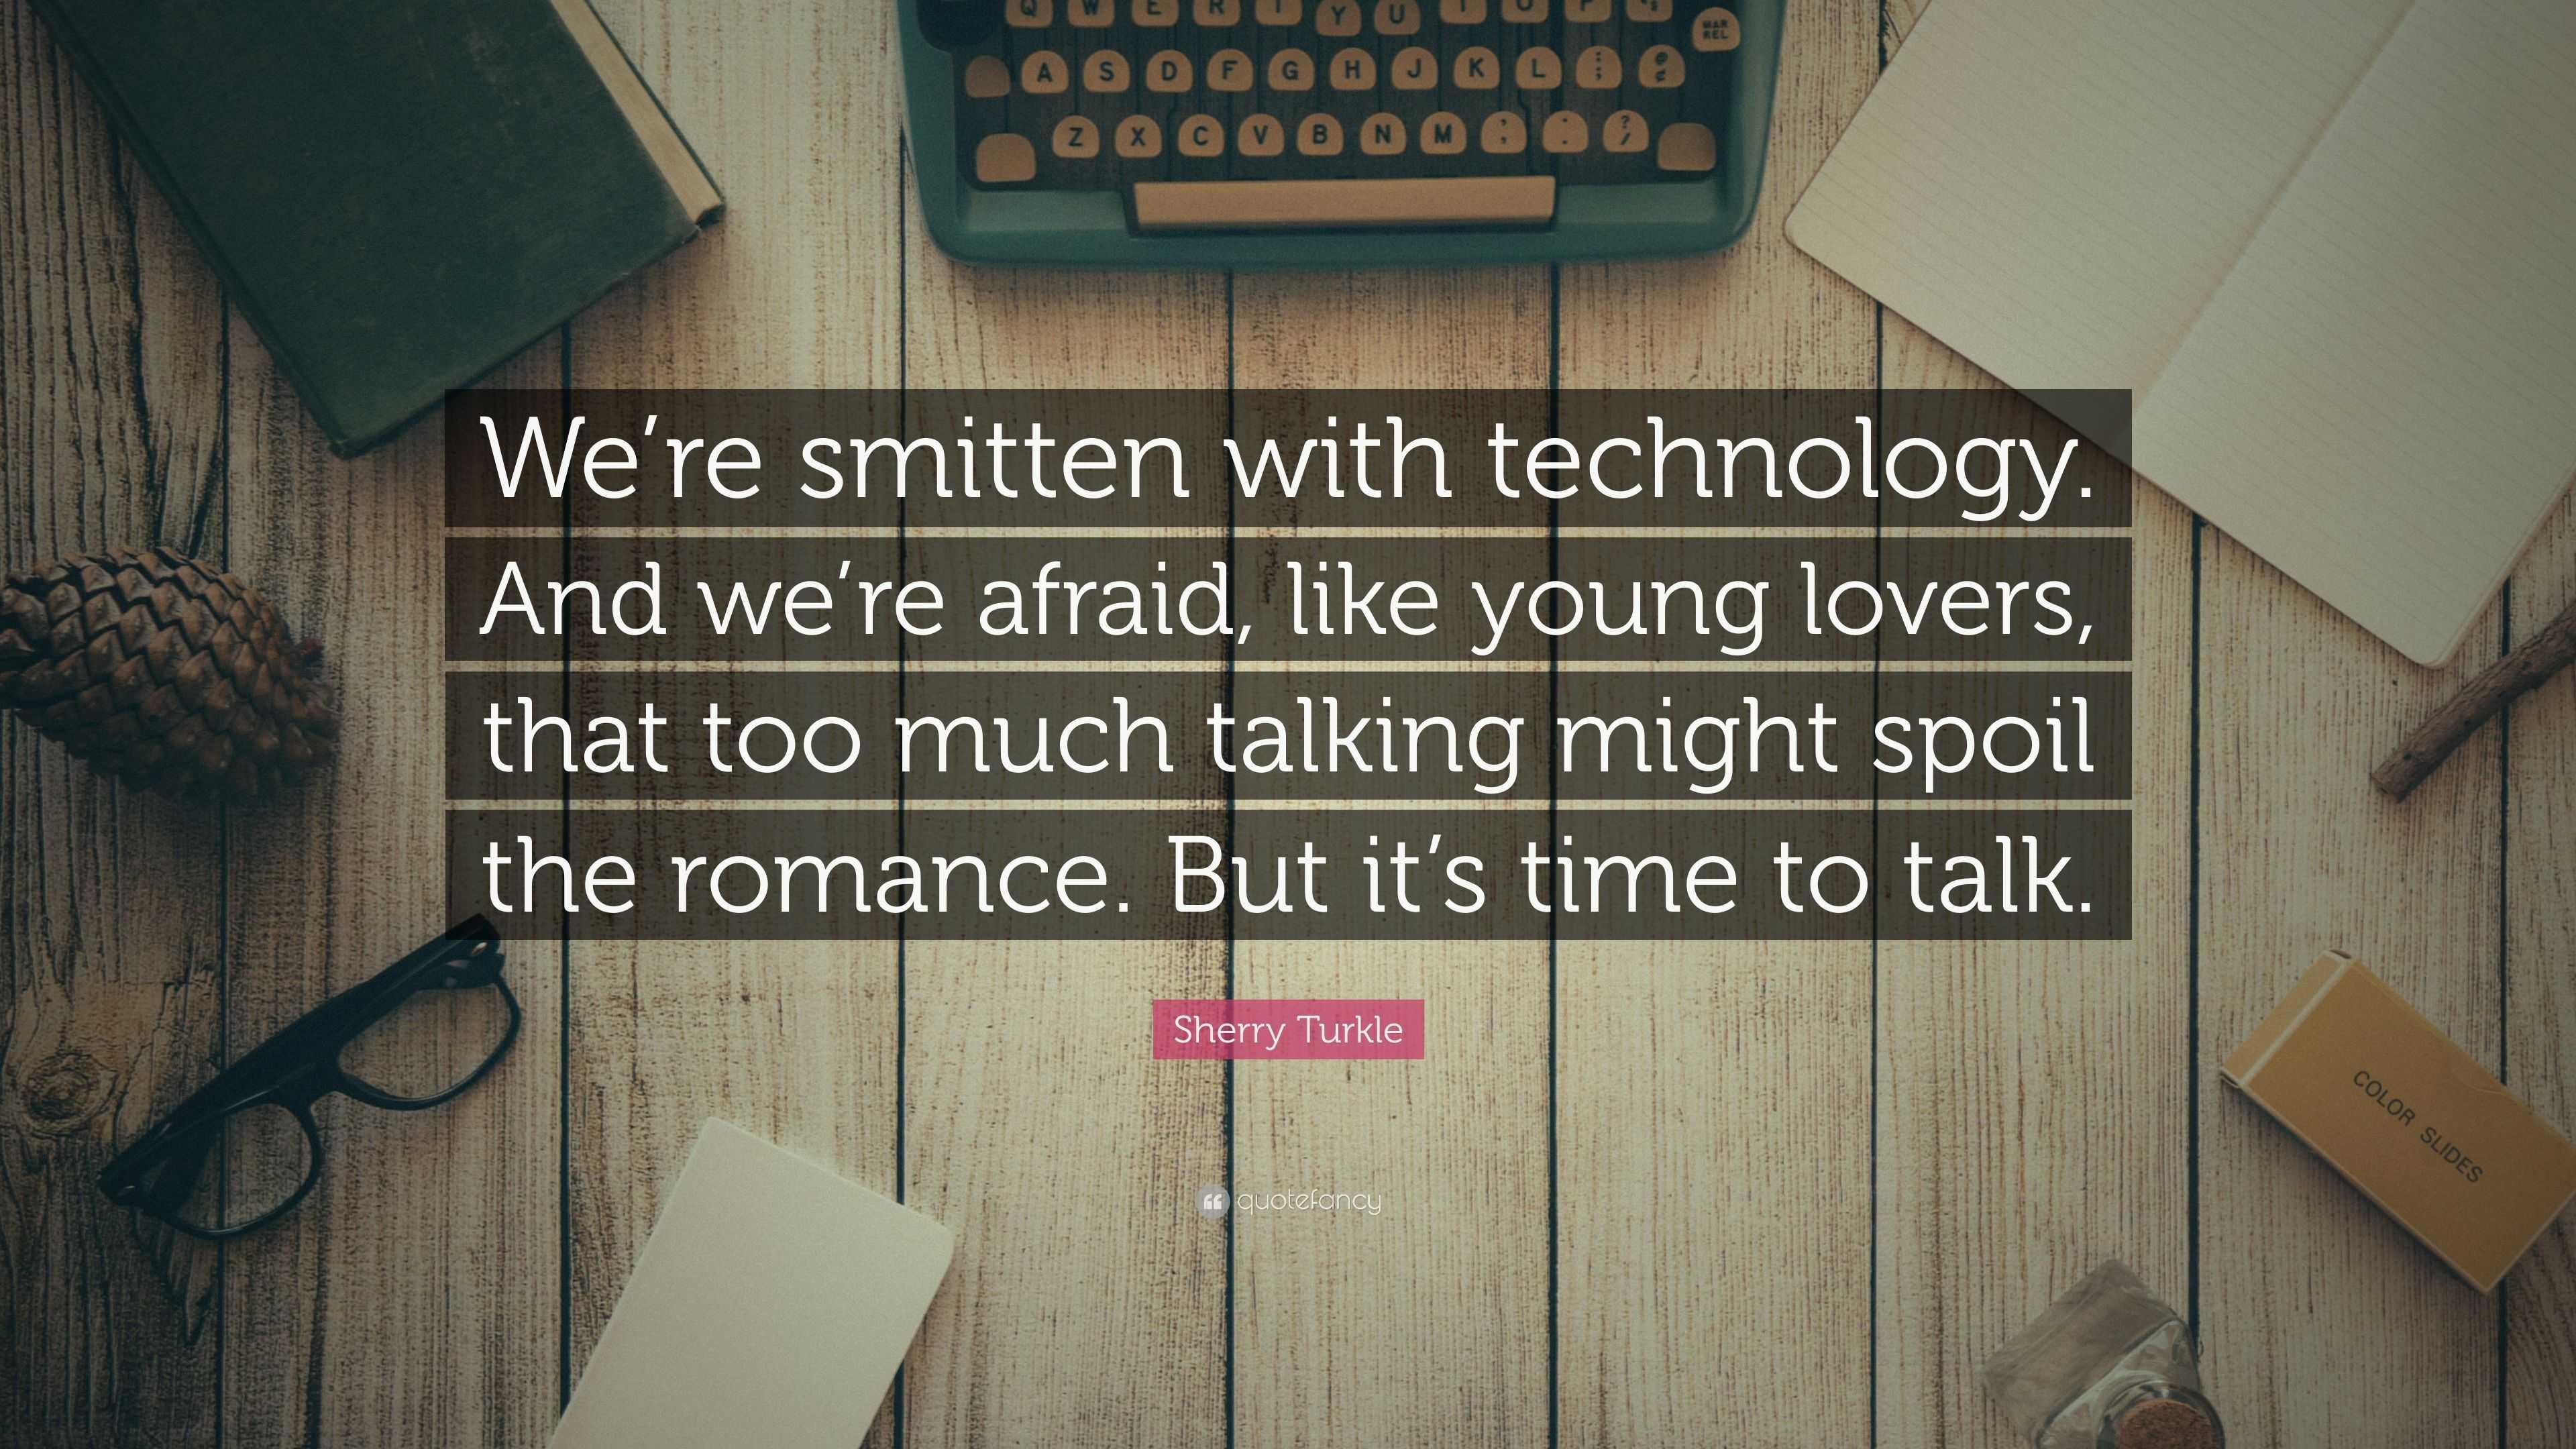 Sherry Turkle Quote u201cWeu0027re smitten with technology